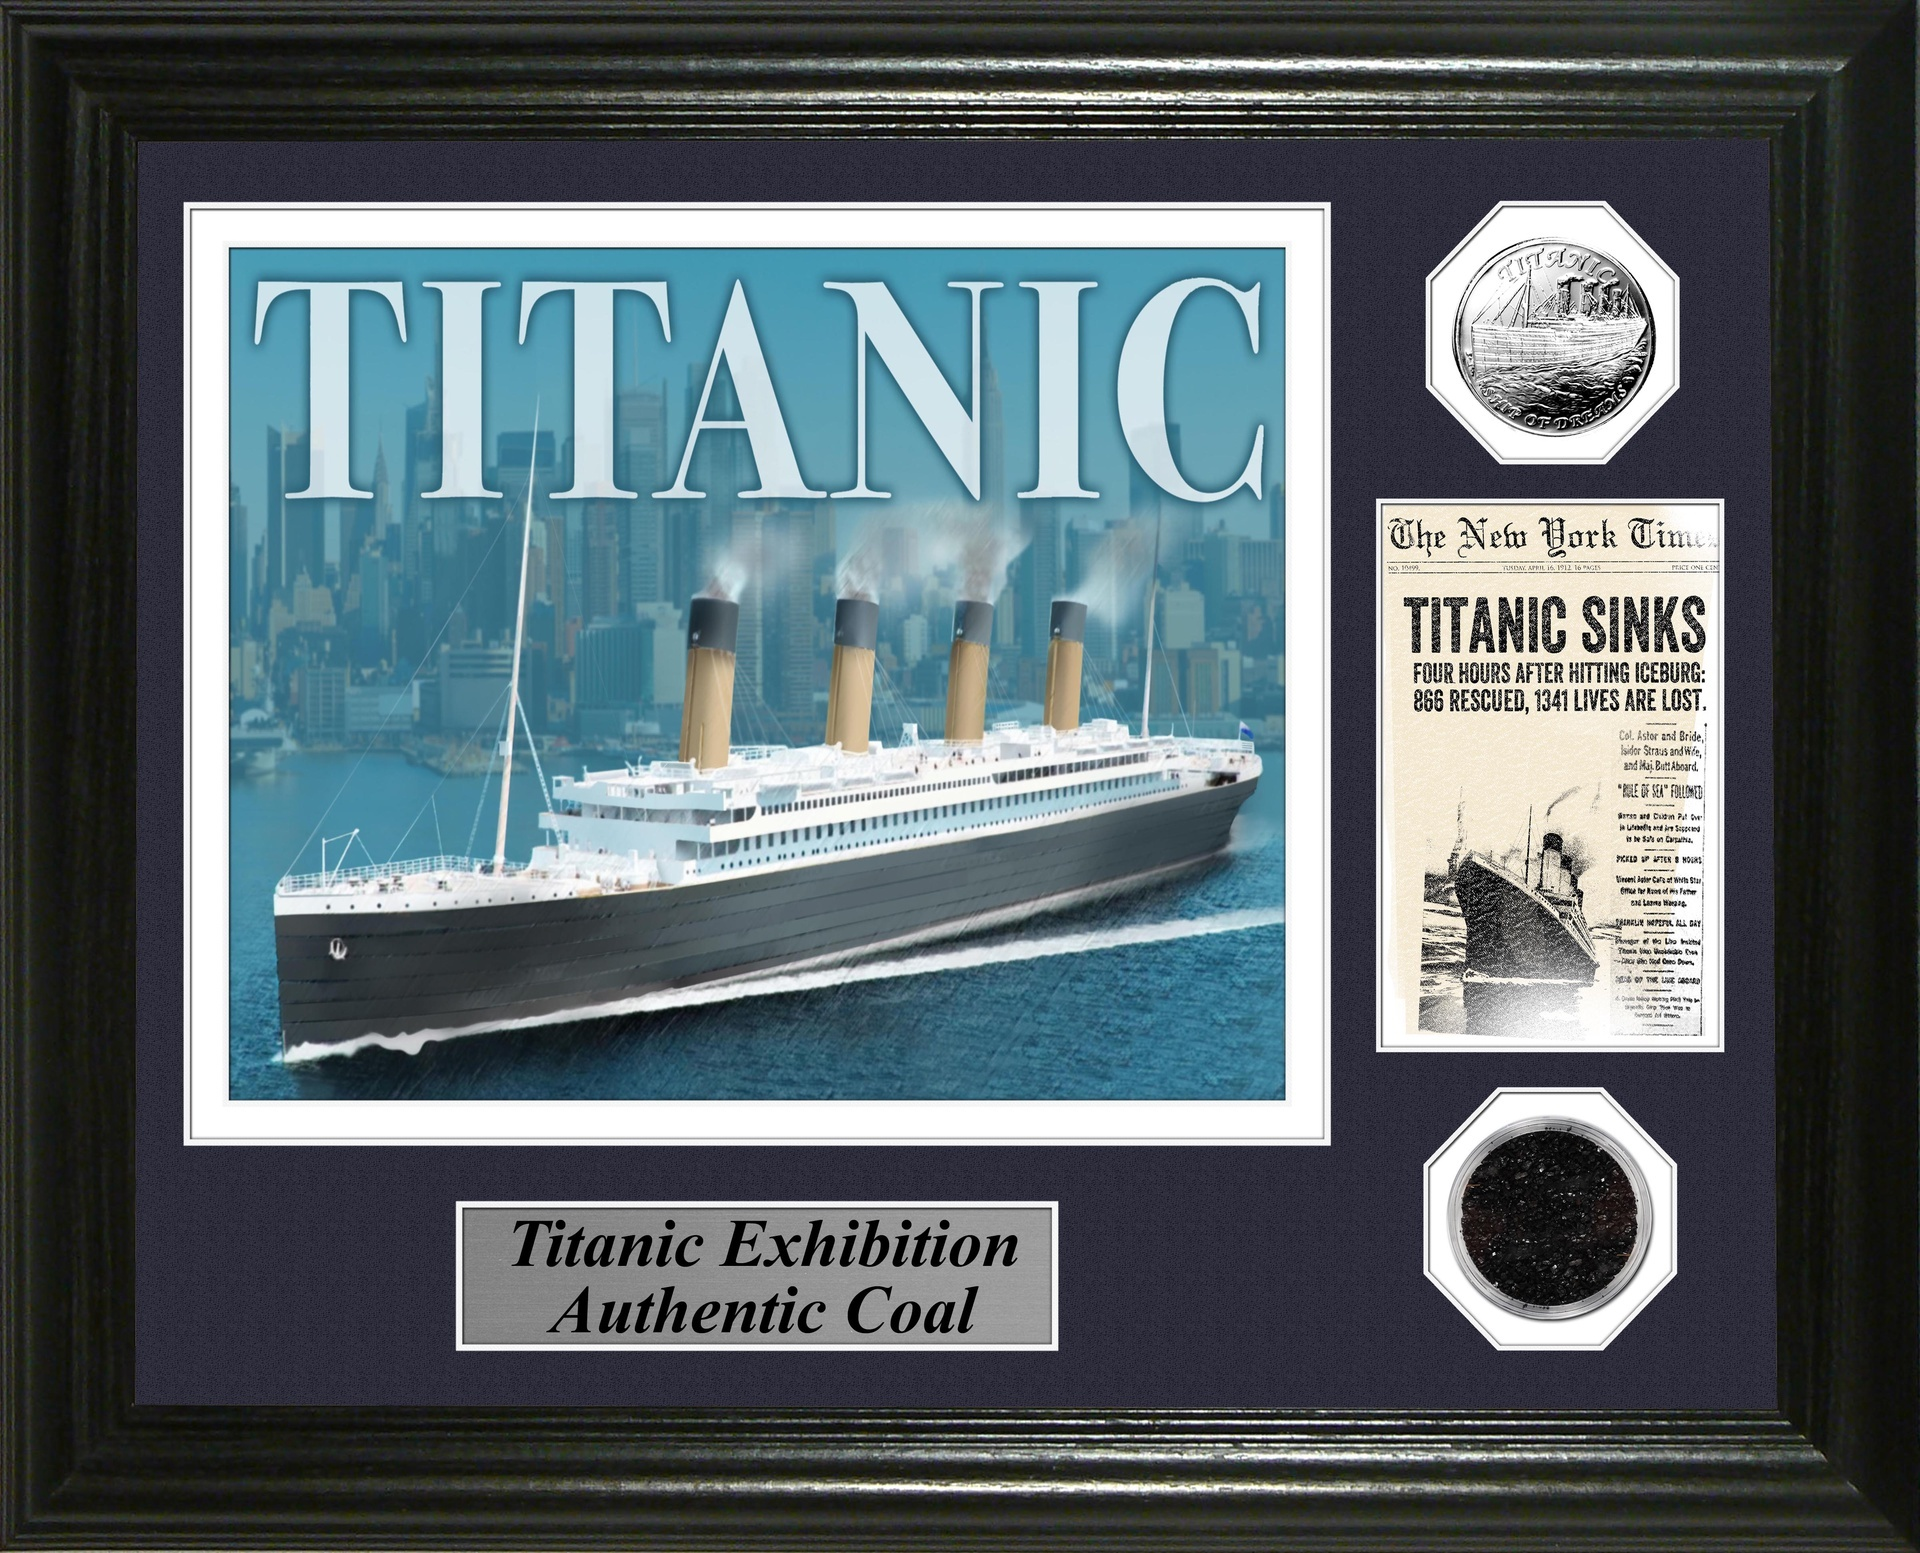 Titanic Exhibition 13 x 16 Framed w/Coal/Silver Coin